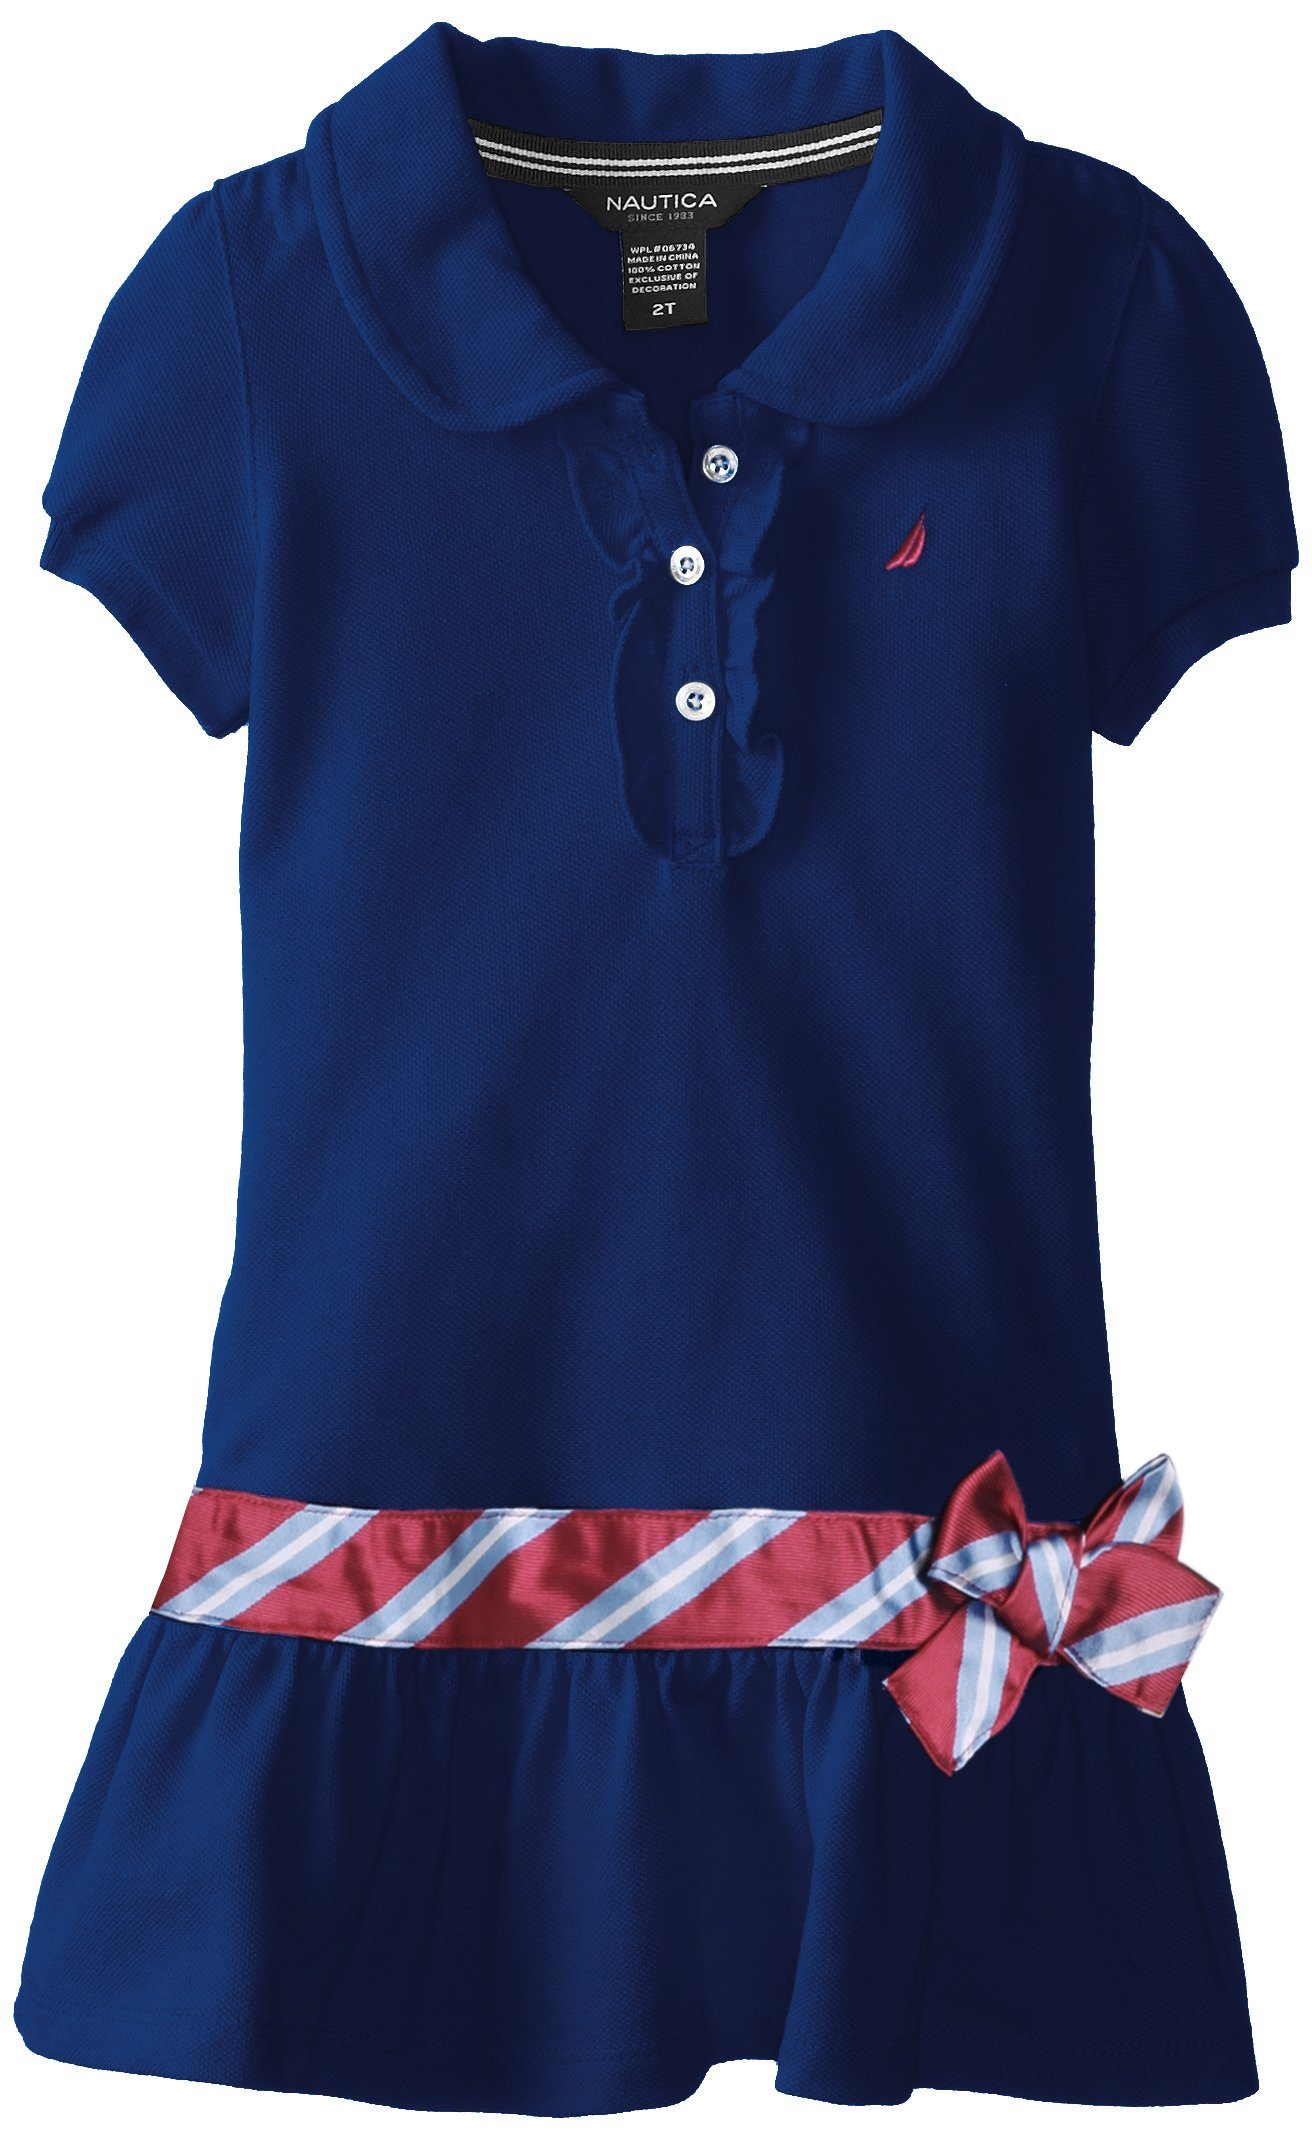 Nautica Little Girls' Pique Polo Dress